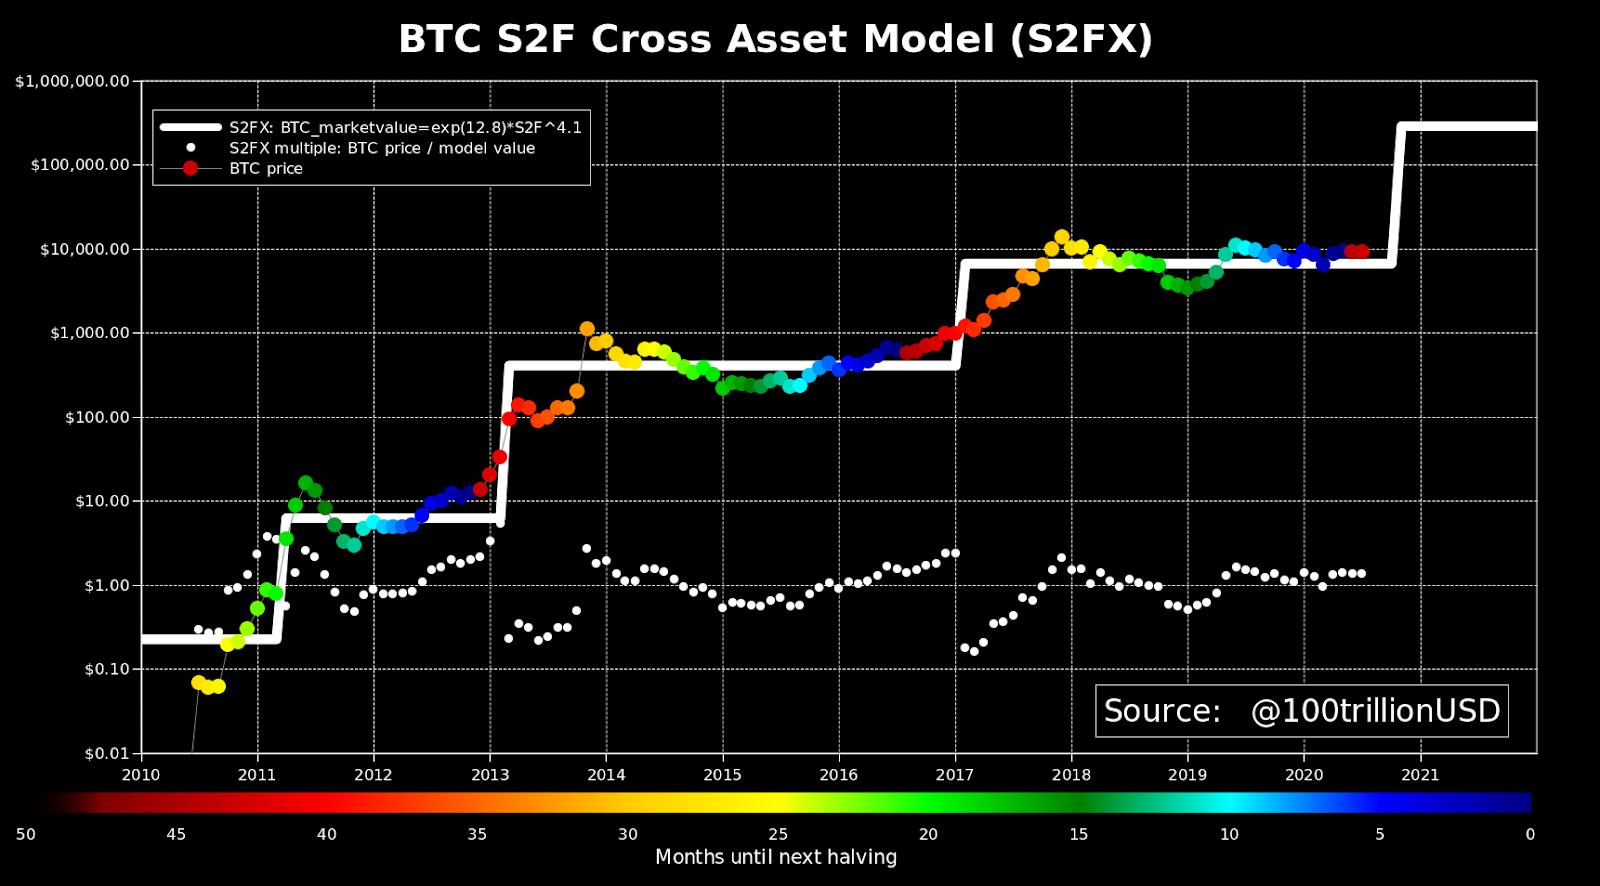 PlanB更新库存流量模型预计比特币下半年暴涨,此轮牛市峰值将达28.8万美元